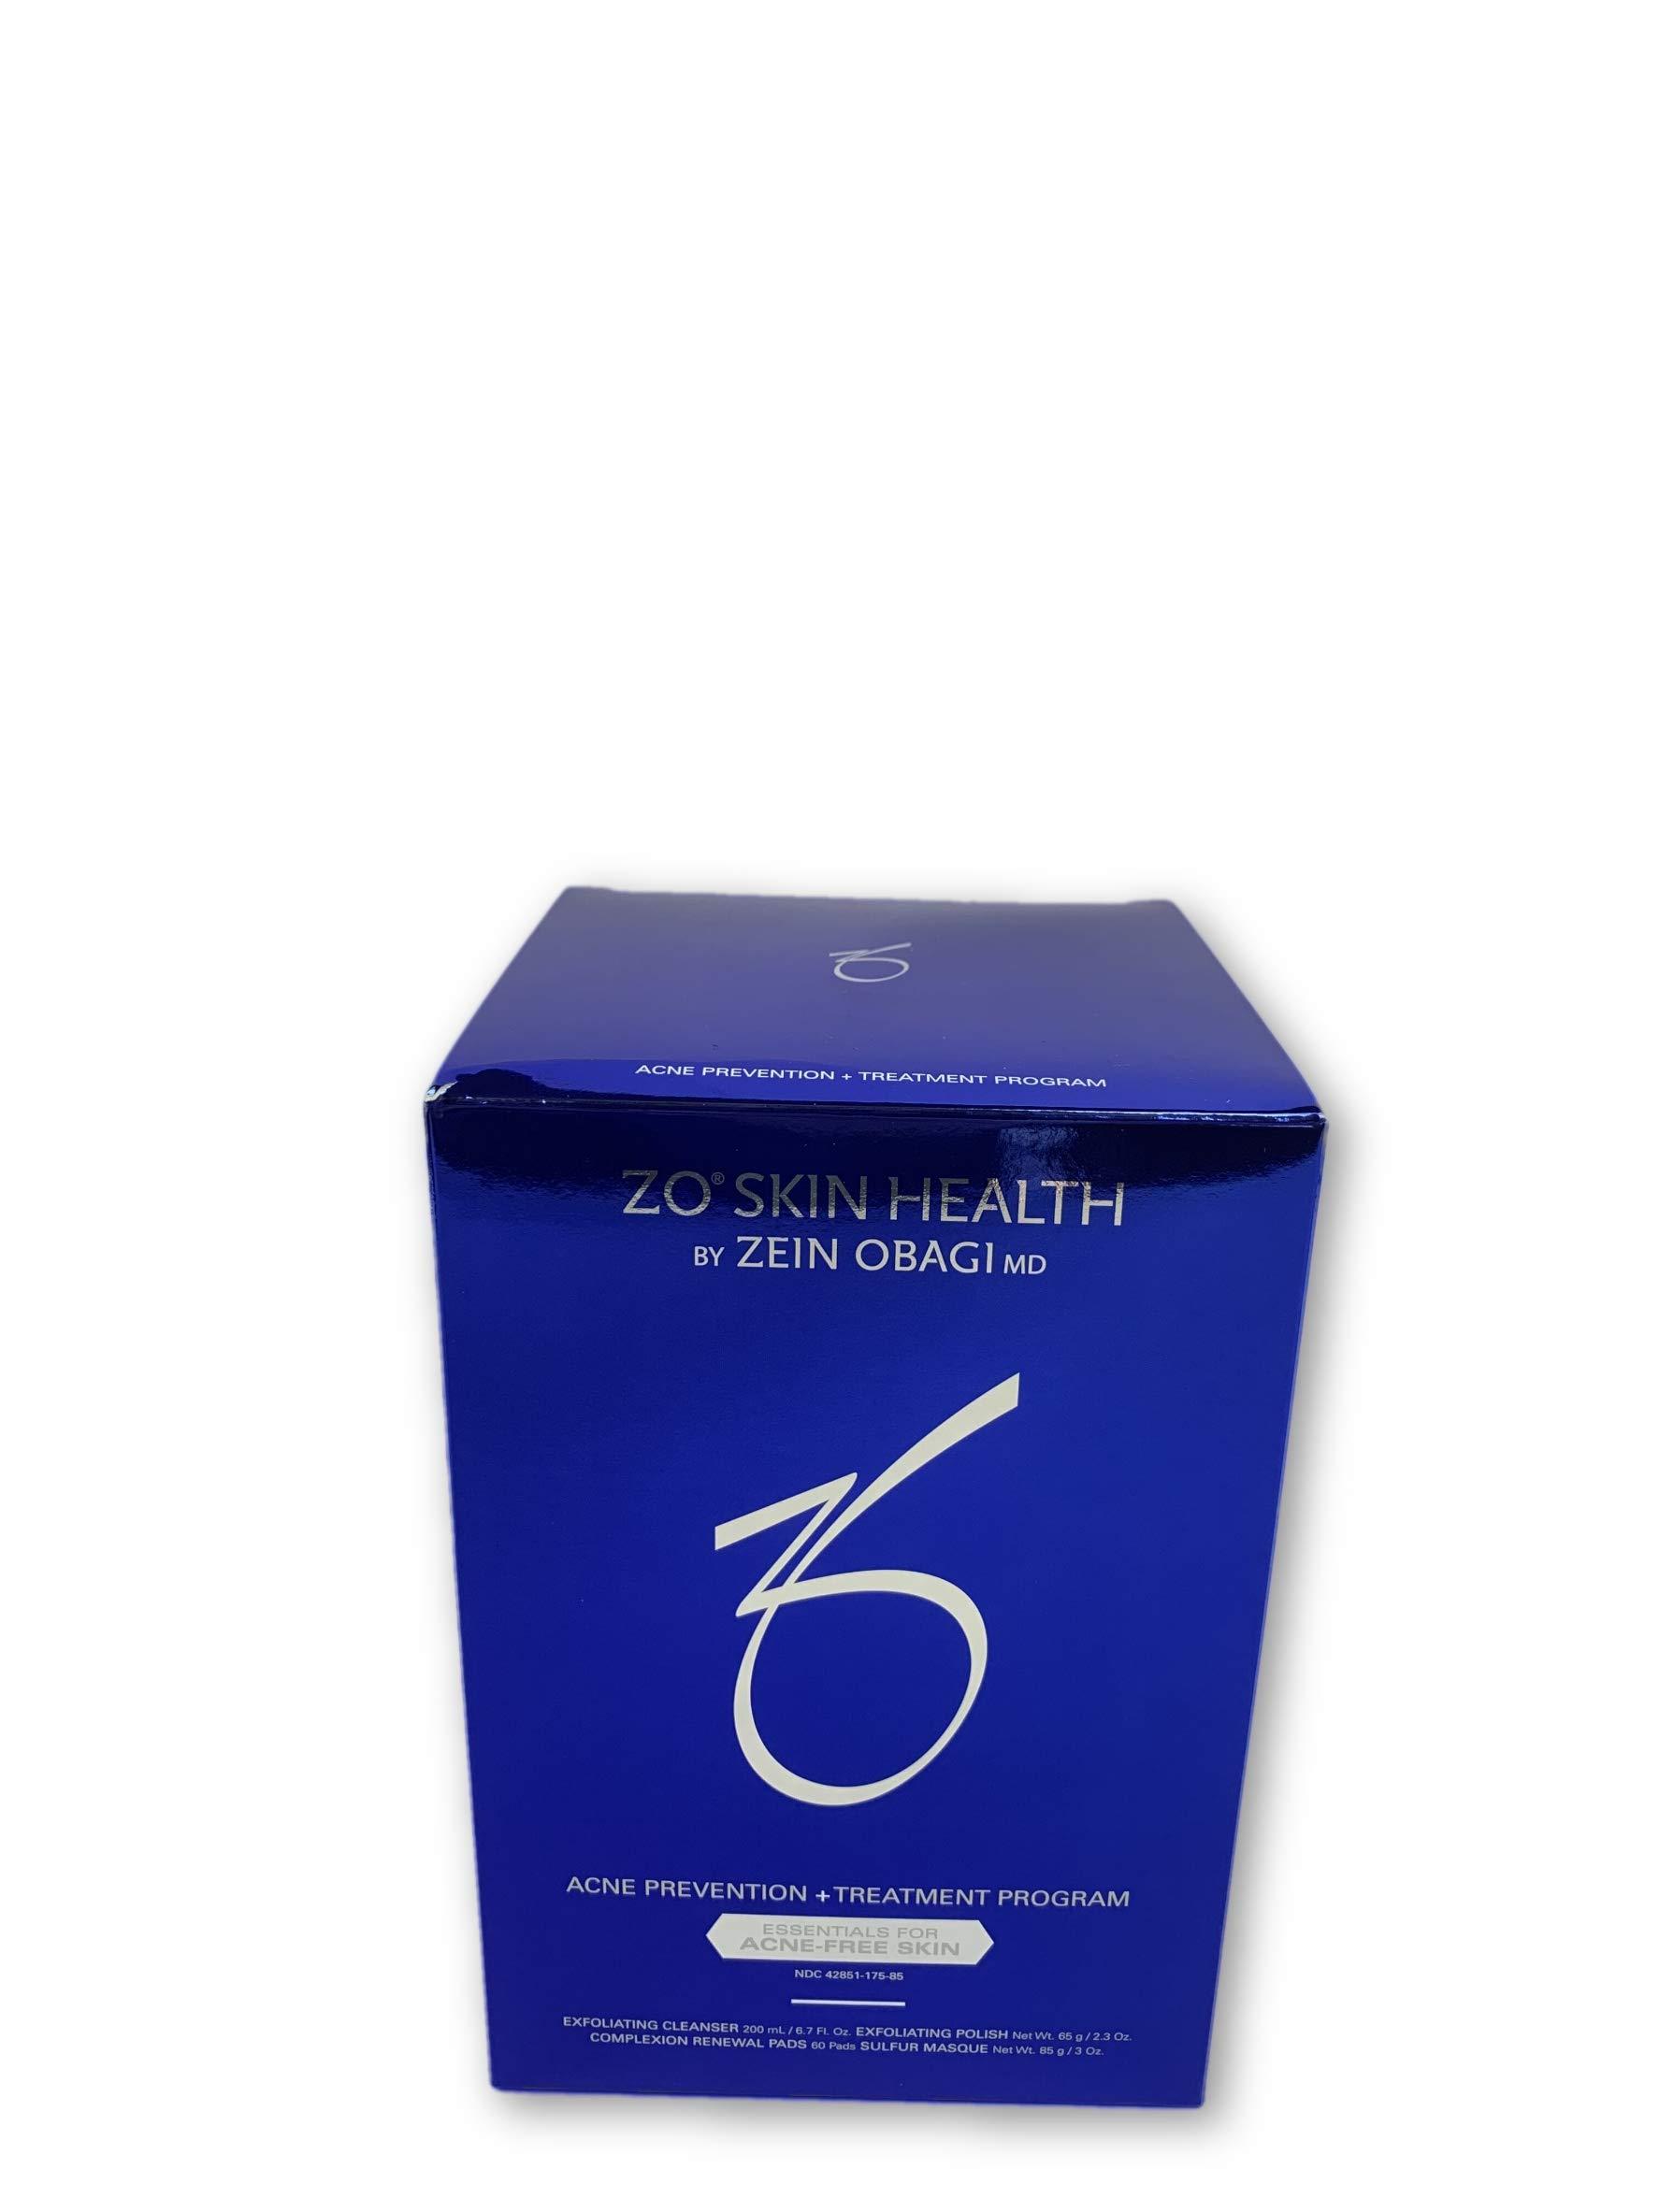 ZO Skin Health Acne Prevention + Treatment Program